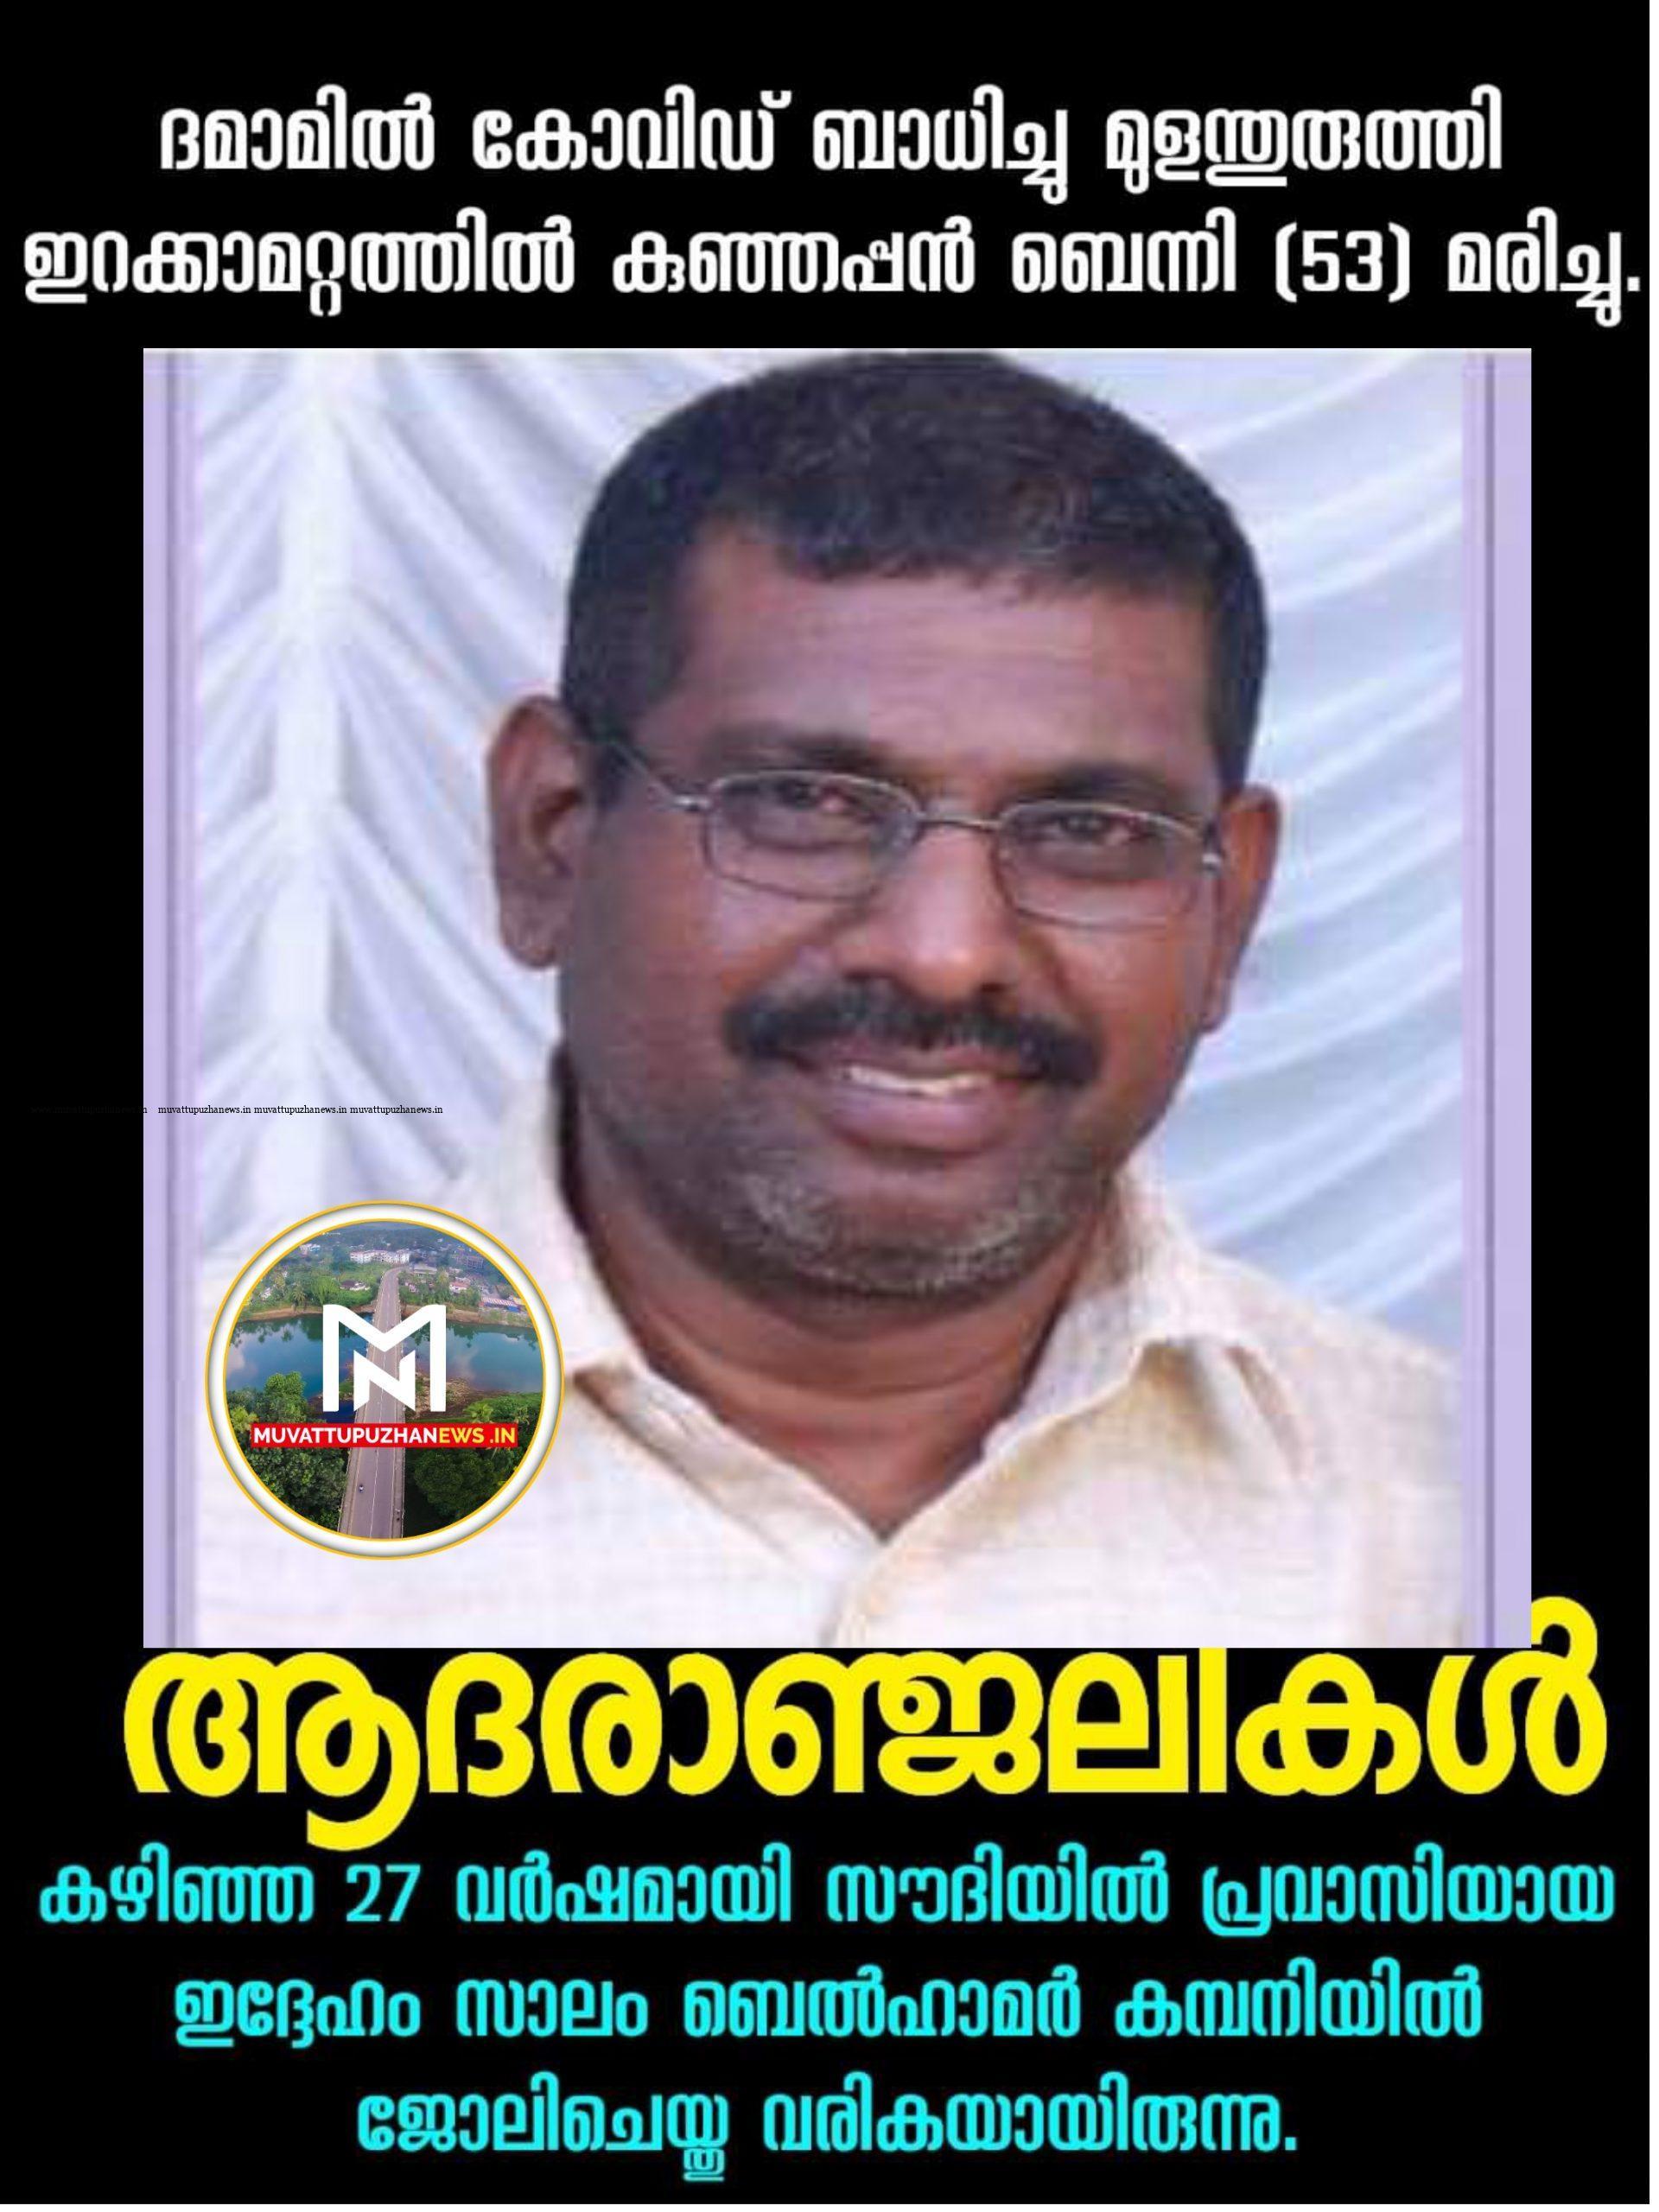 Photo of കോവിഡ്-19 ബാധിച്ചു എറണാകുളം സ്വദേശി ദമാമില് മരിച്ചു